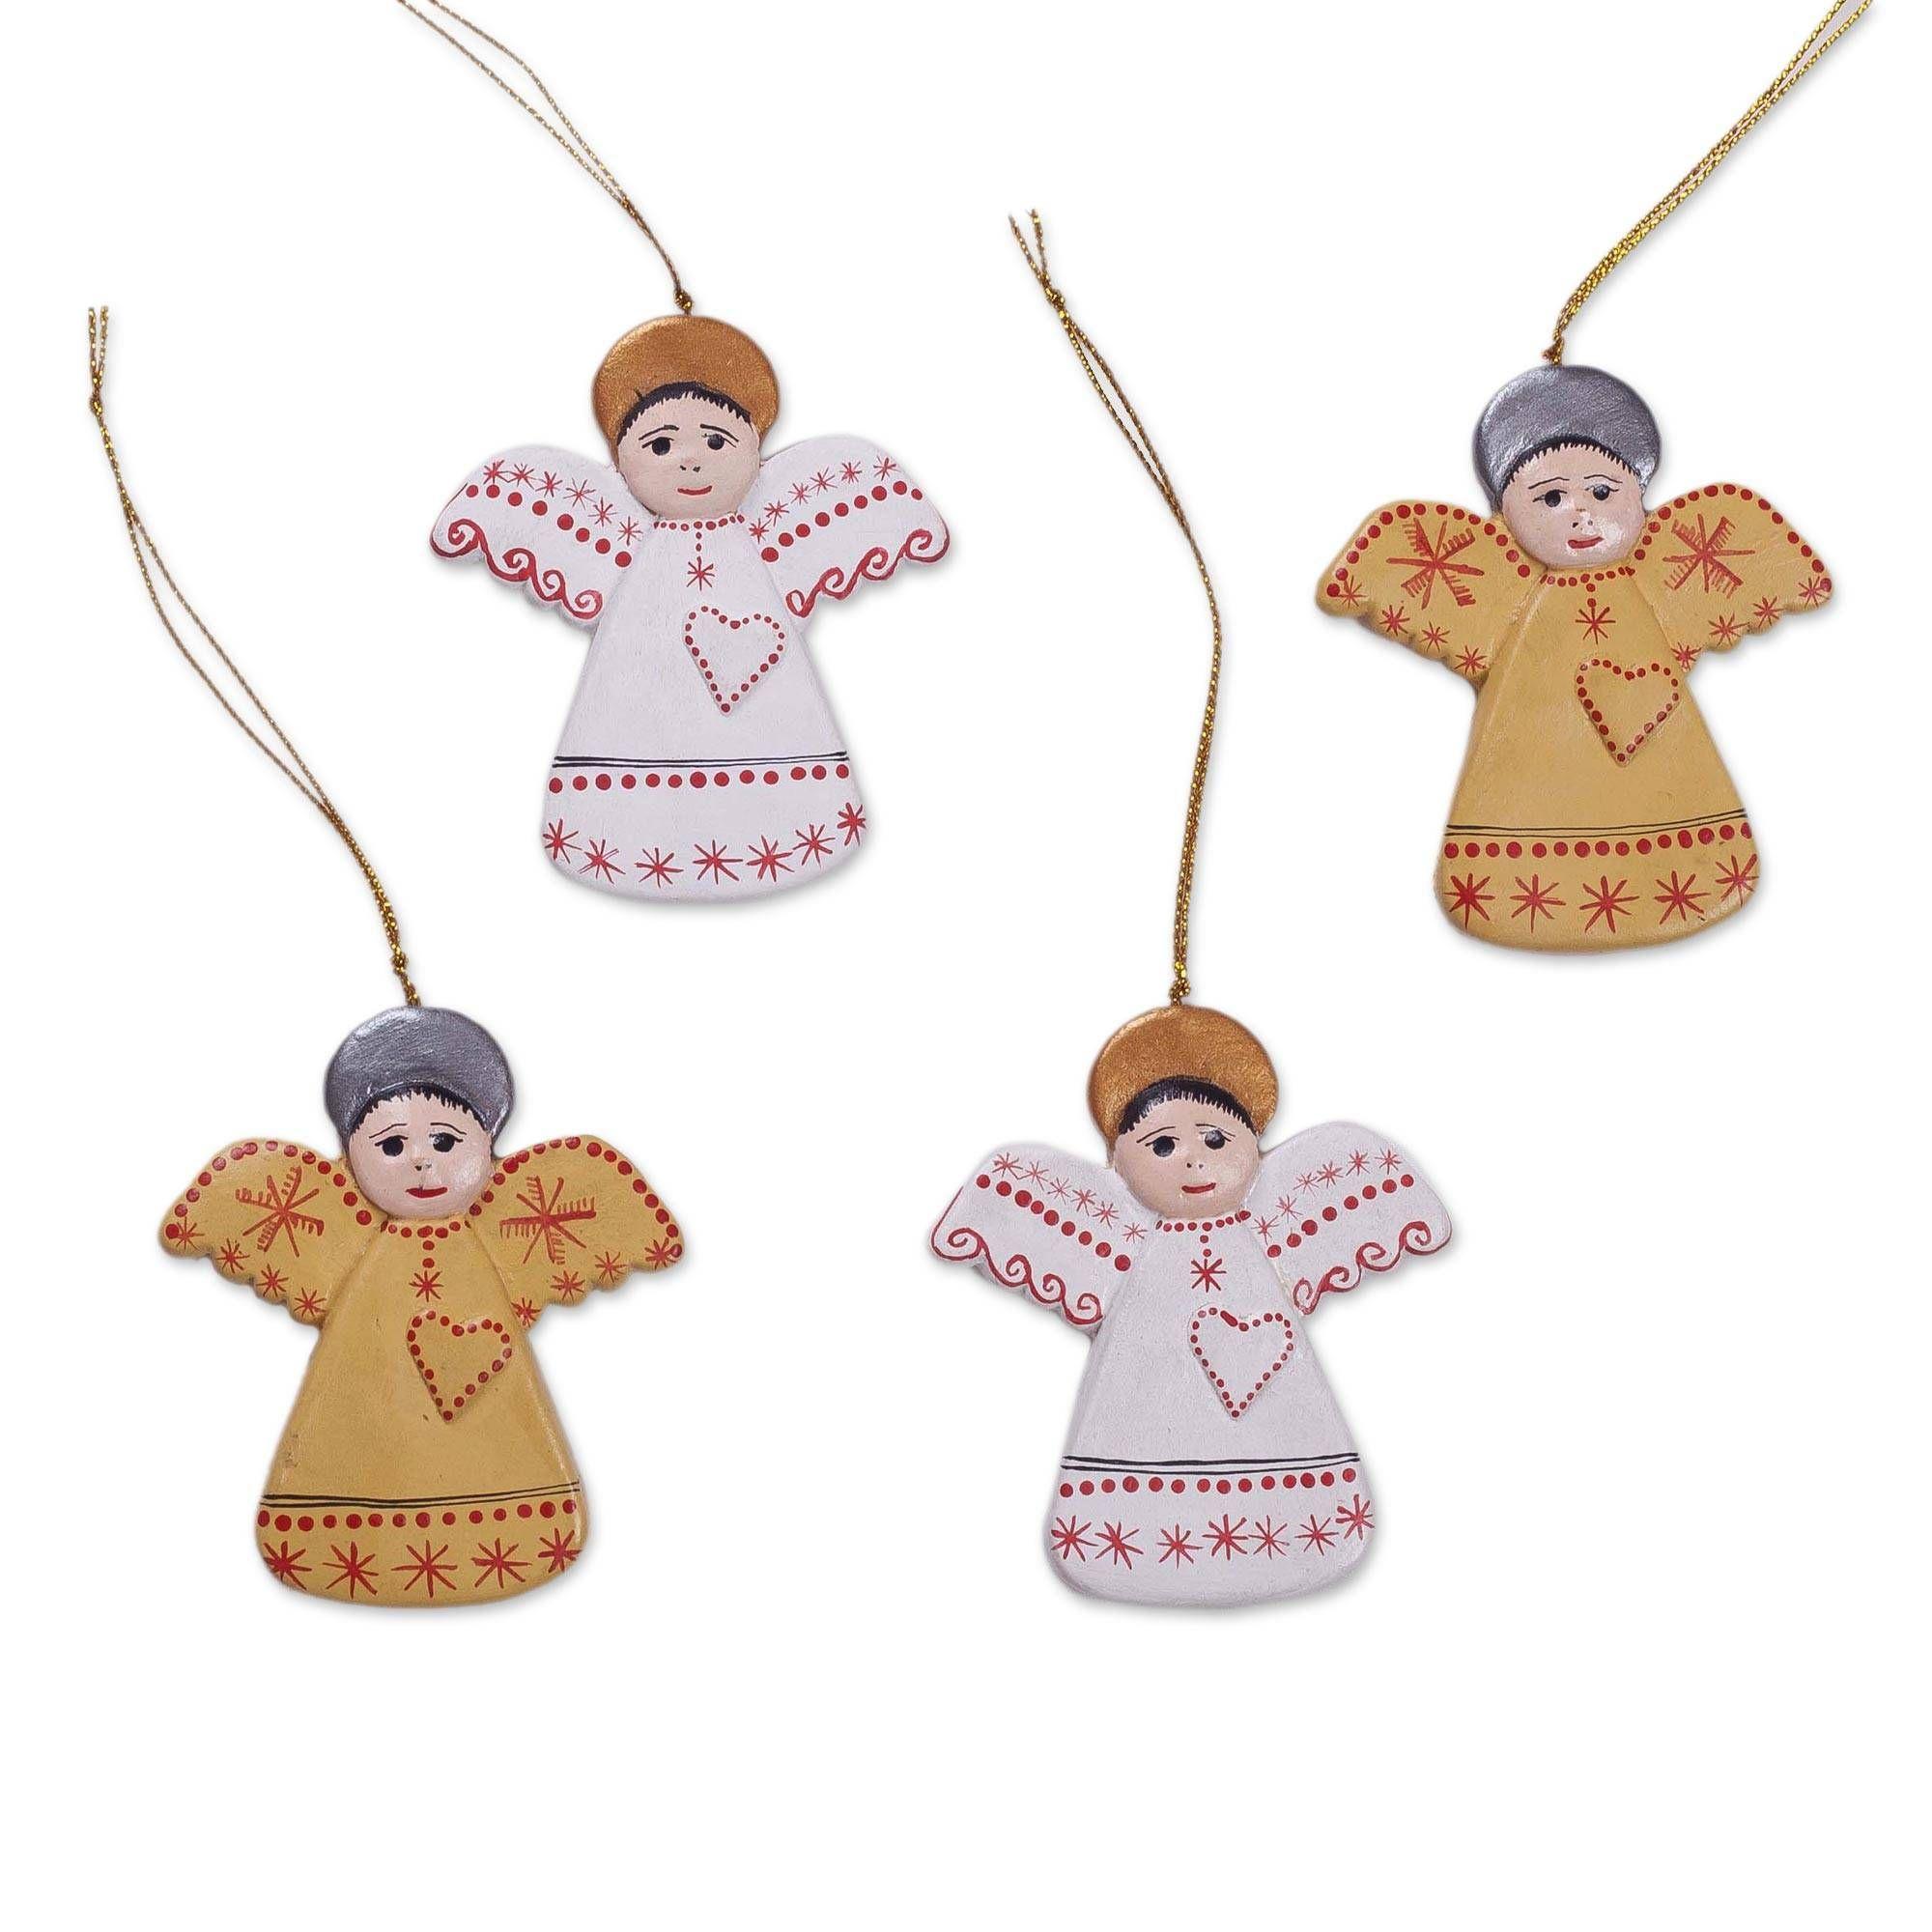 Dear Santa Define Naughty Funny Christmas Gifts Christmas Ornaments Handmade Custom Gift Personalized Gift Funny Christmas Gifts Family Ornament Dear Santa